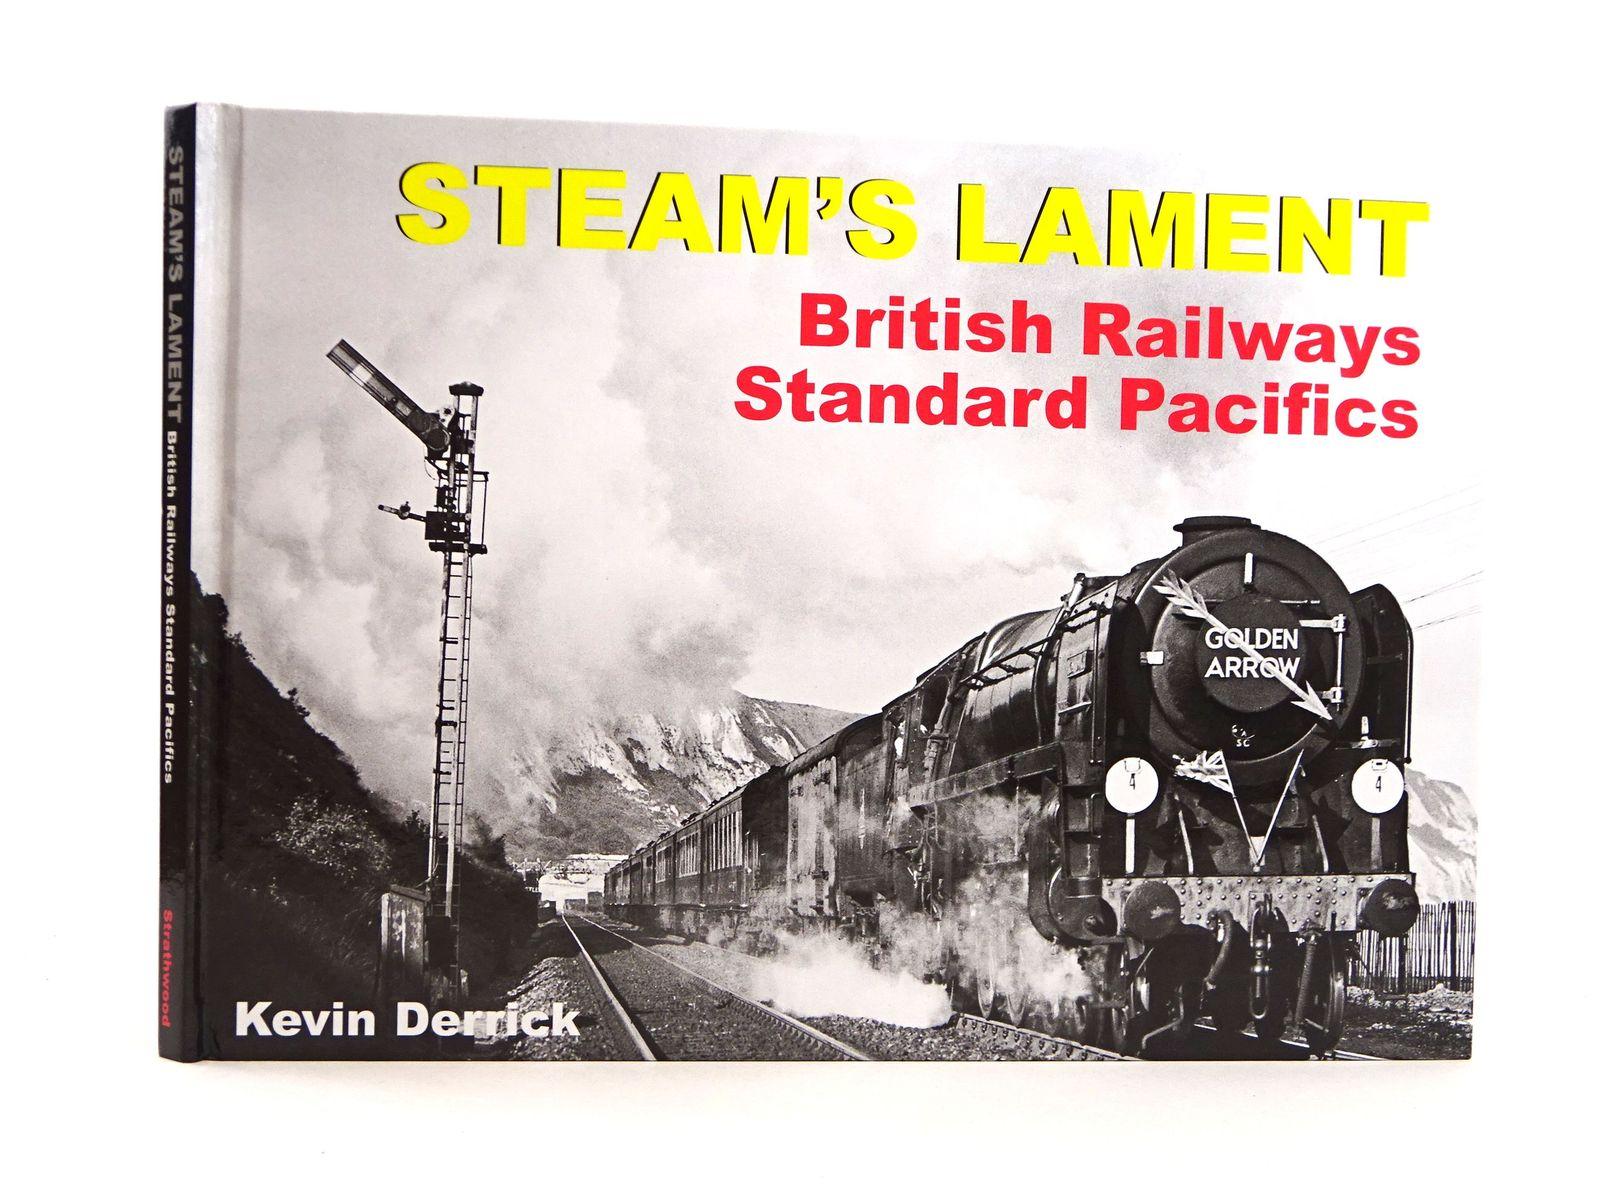 Photo of STEAM'S LAMENT: BRITISH RAILWAYS STANDARD PACIFICS